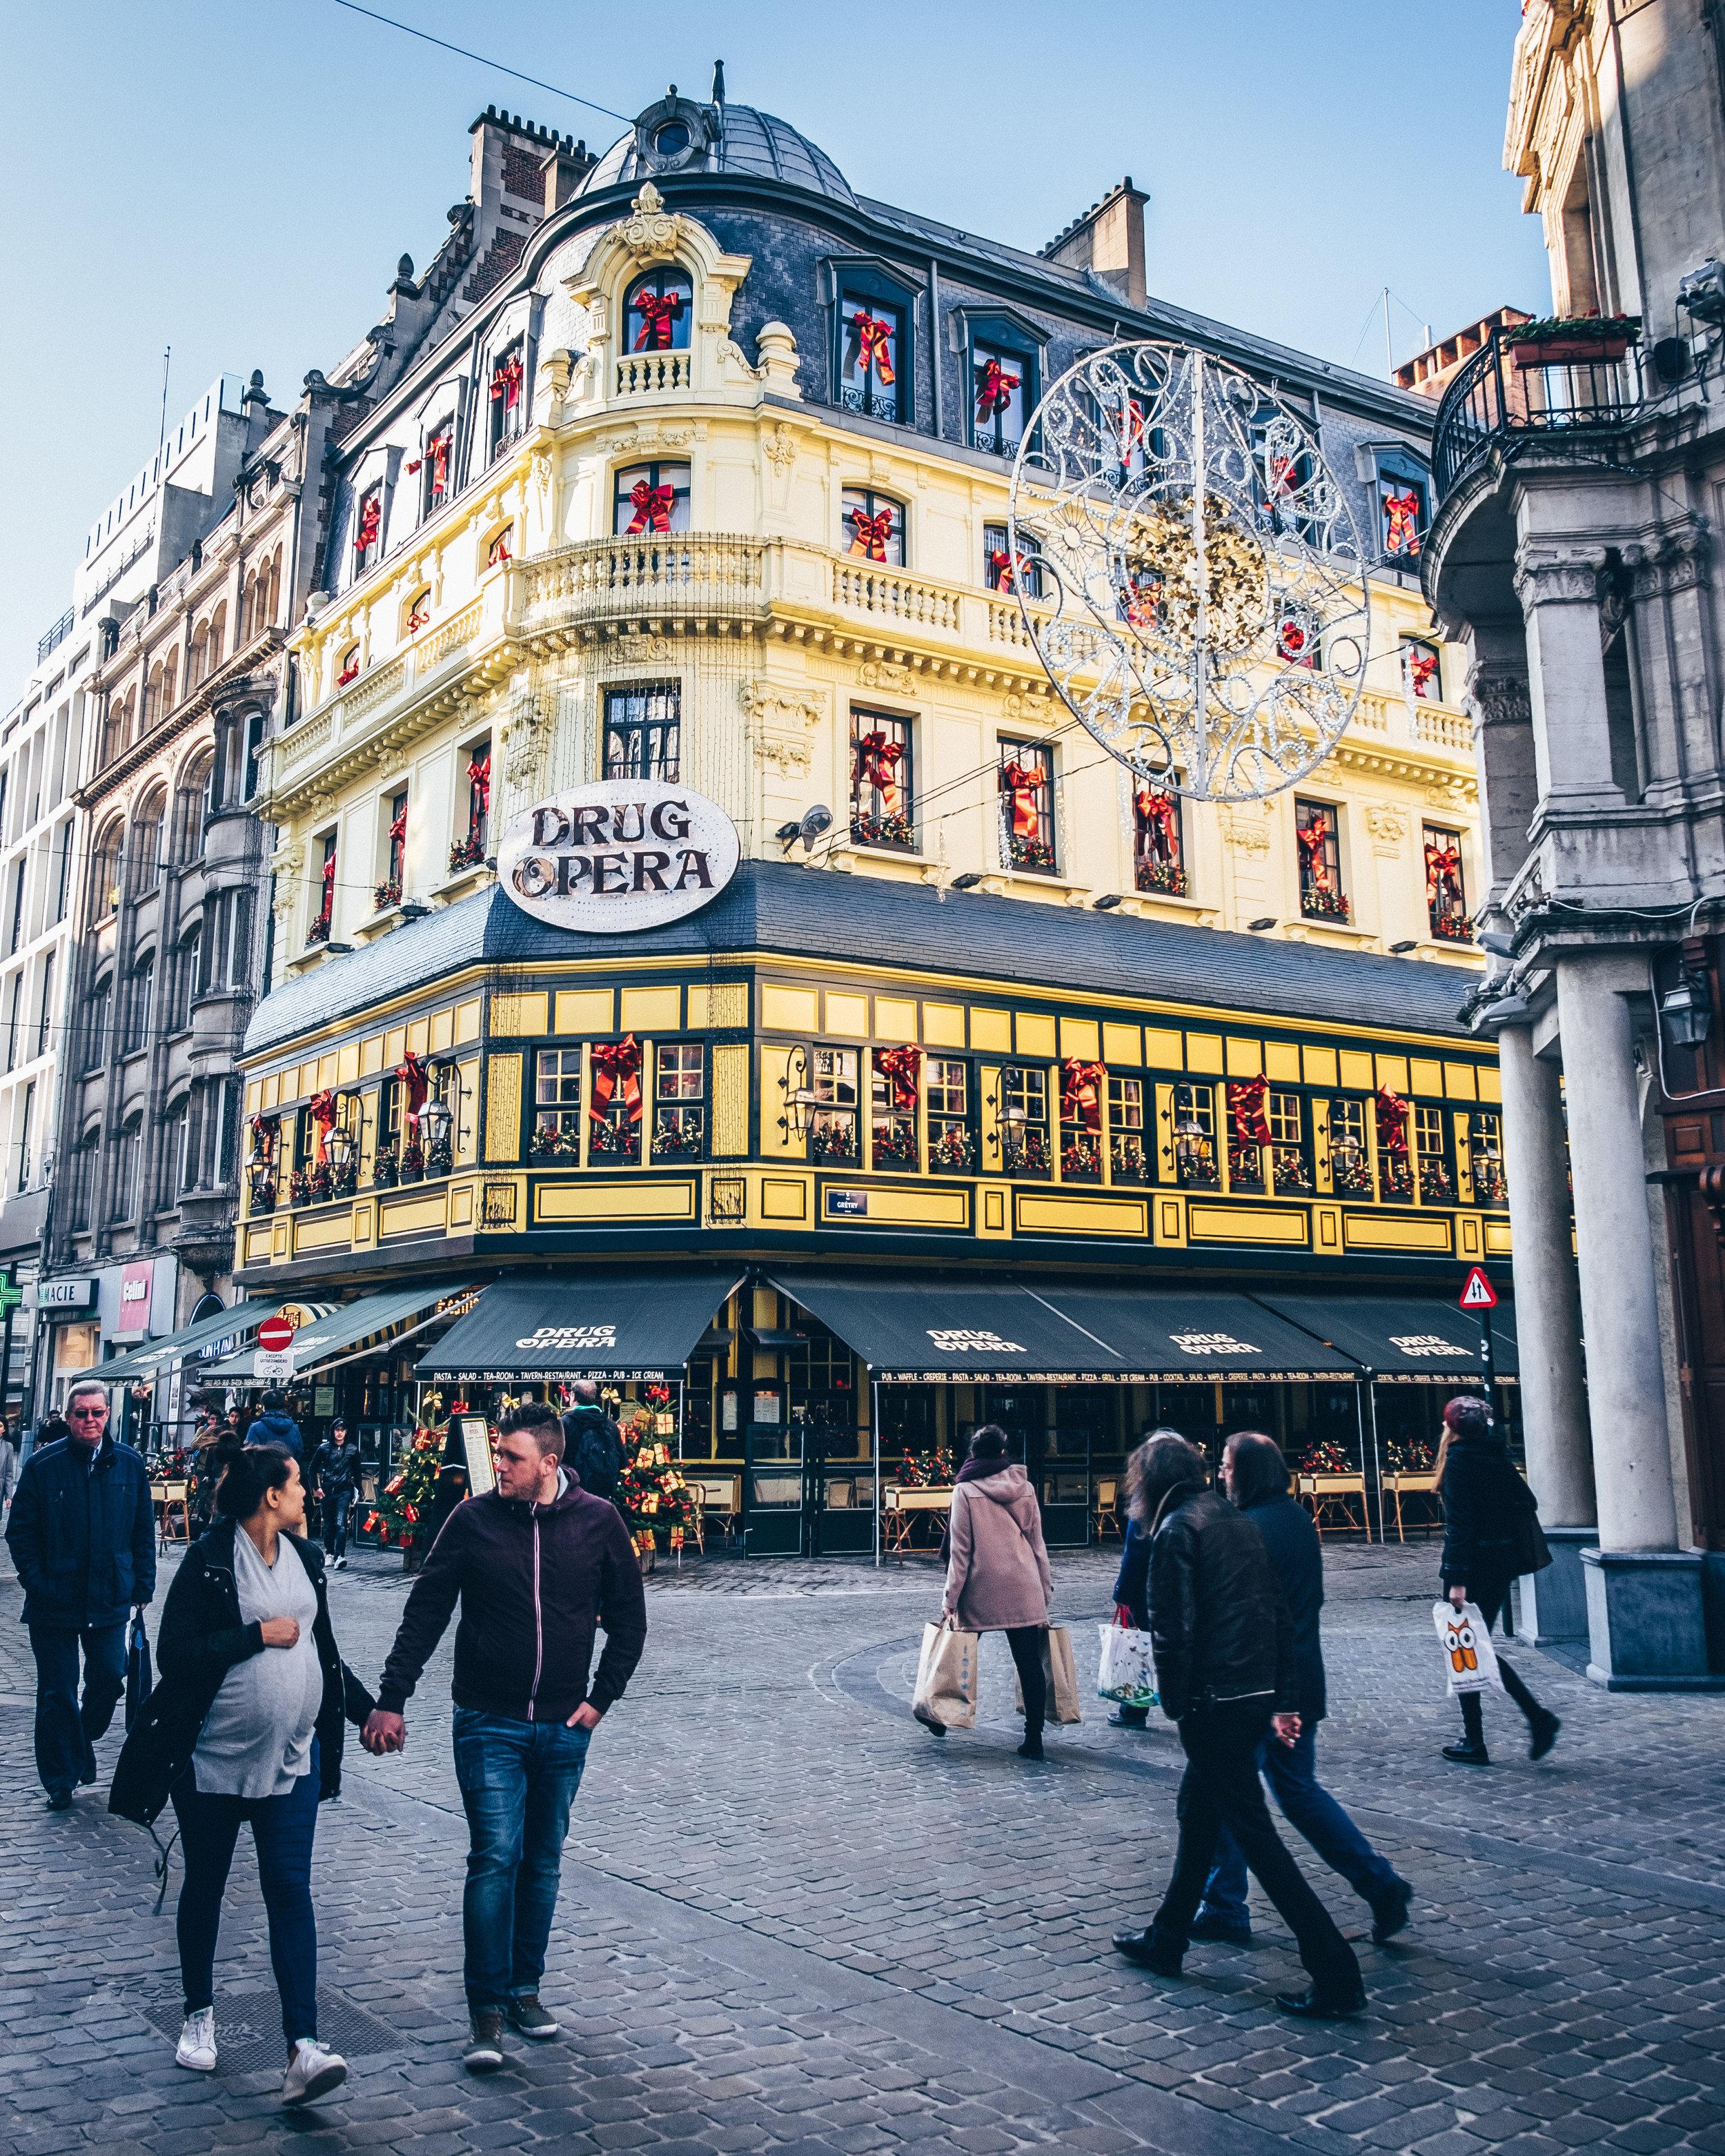 Drug Opera, Brussels